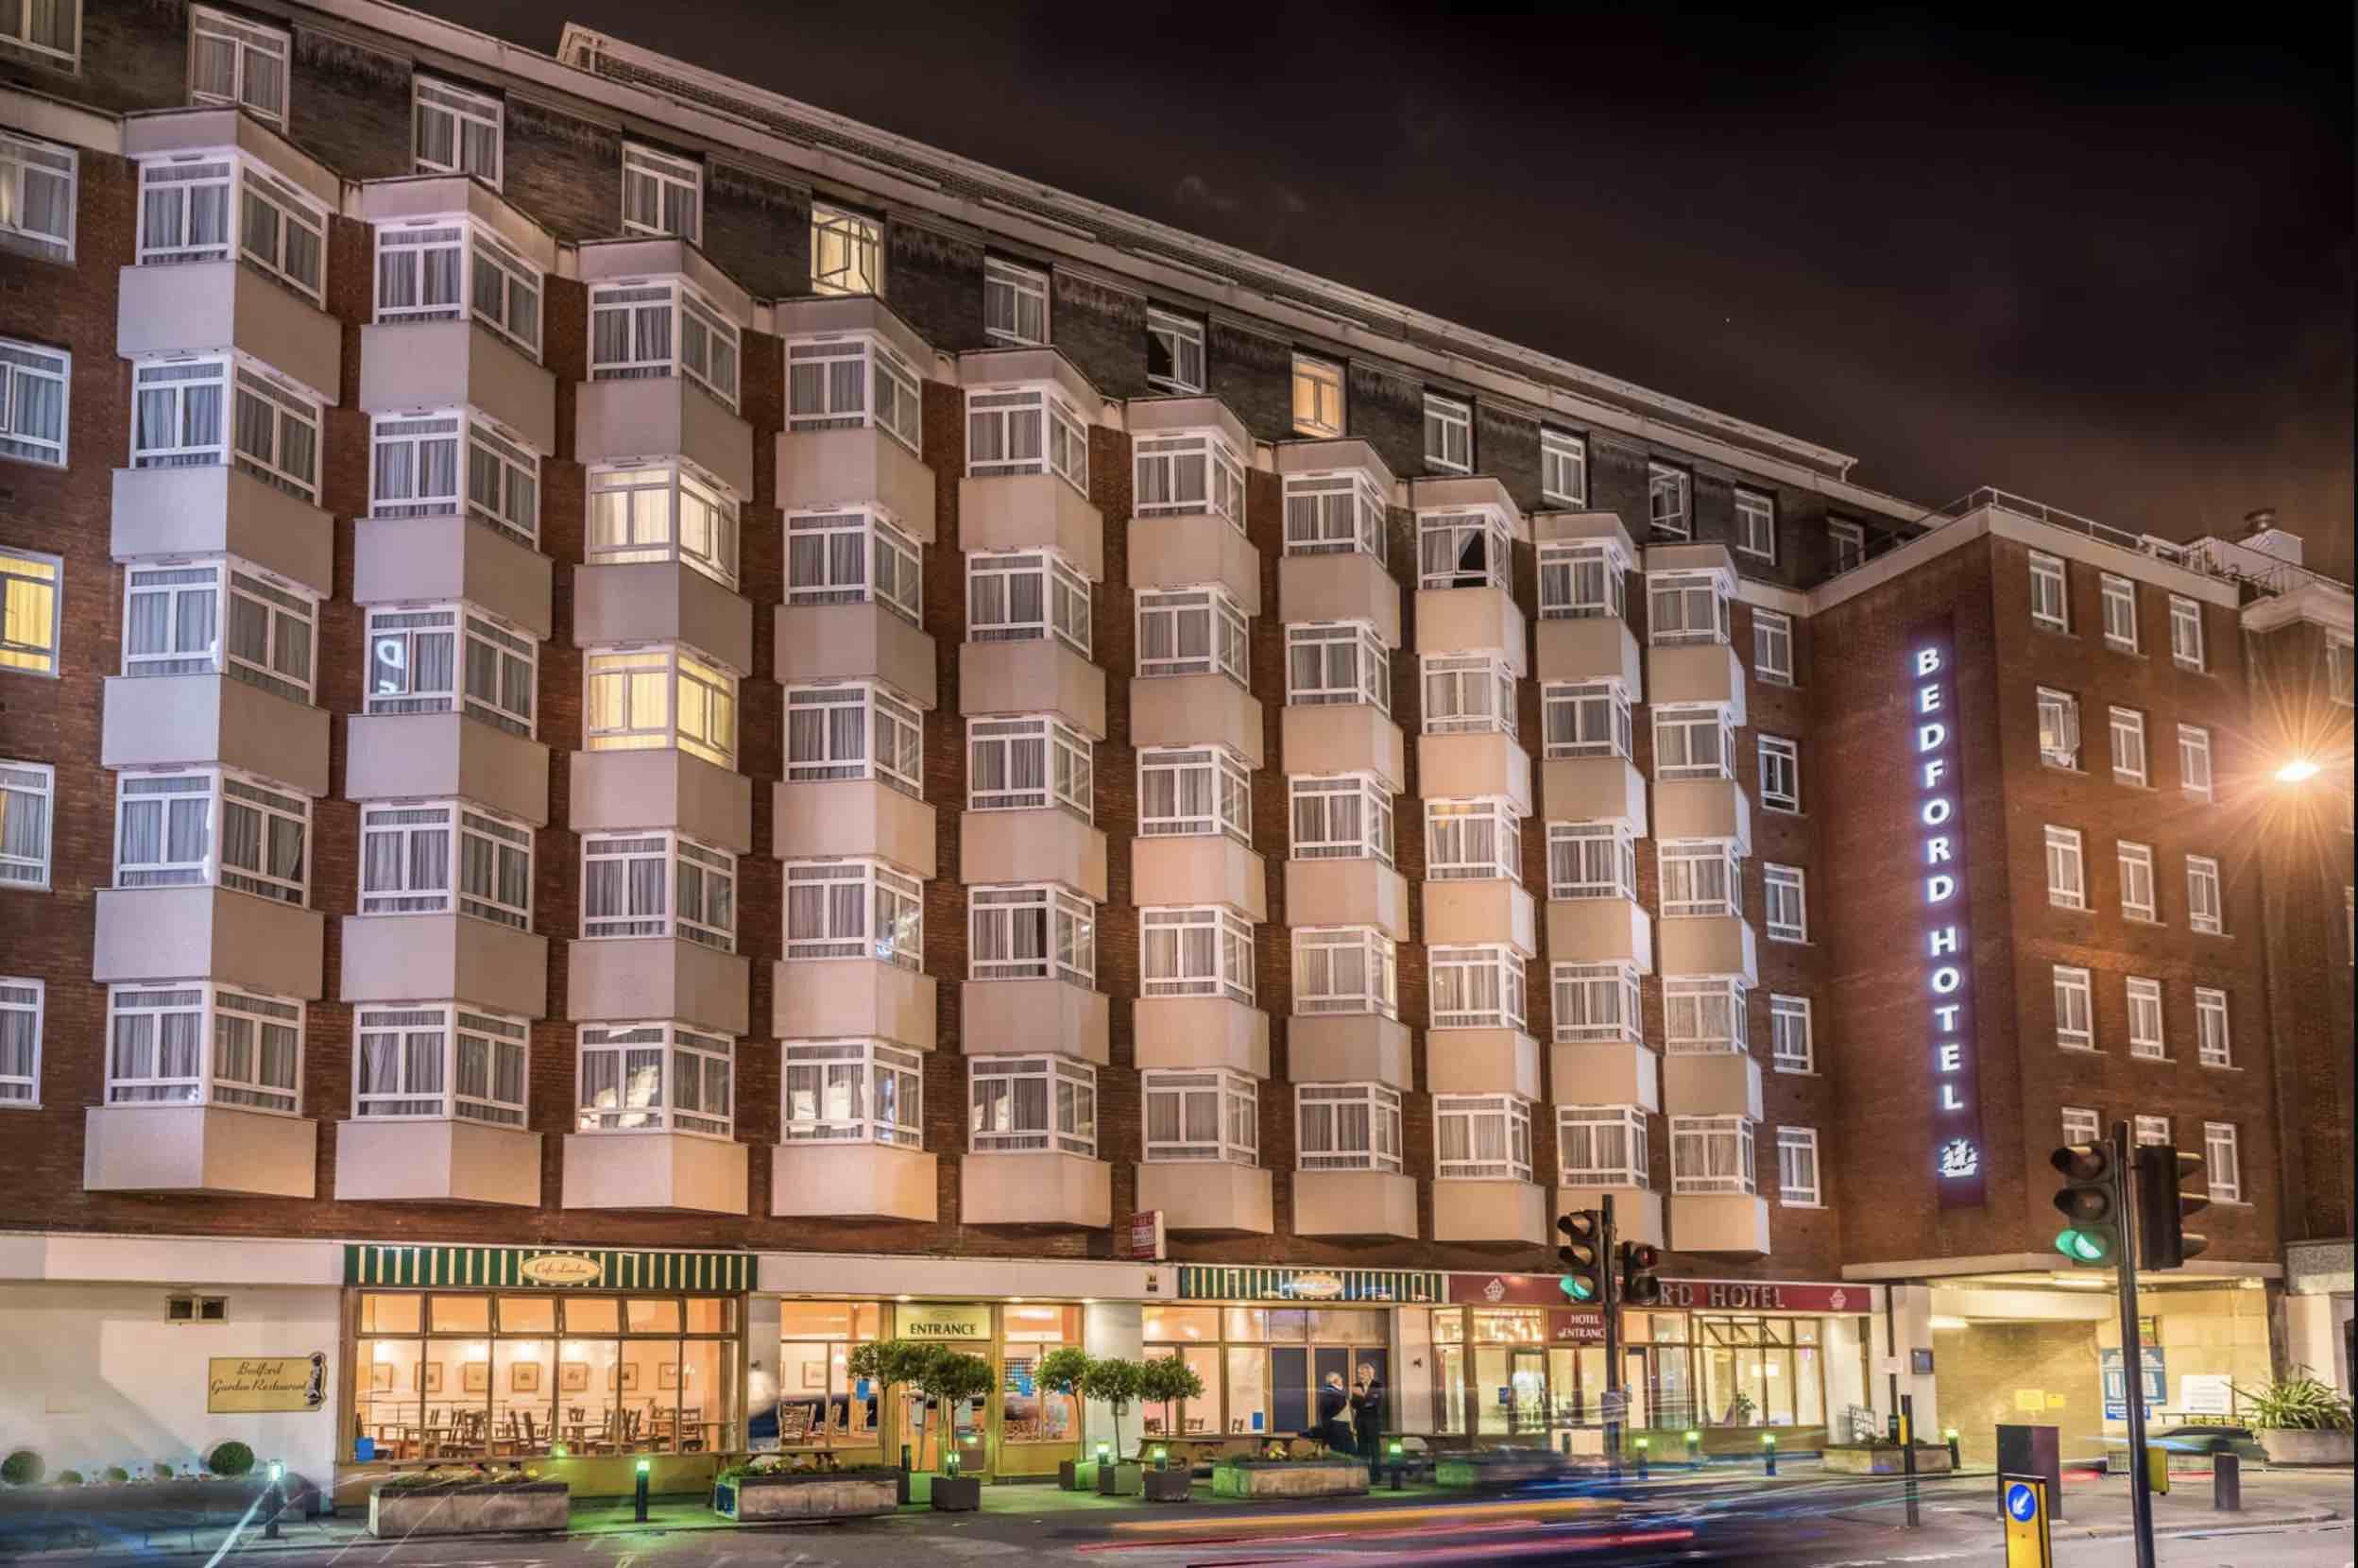 The Bedford Hotel.jpg